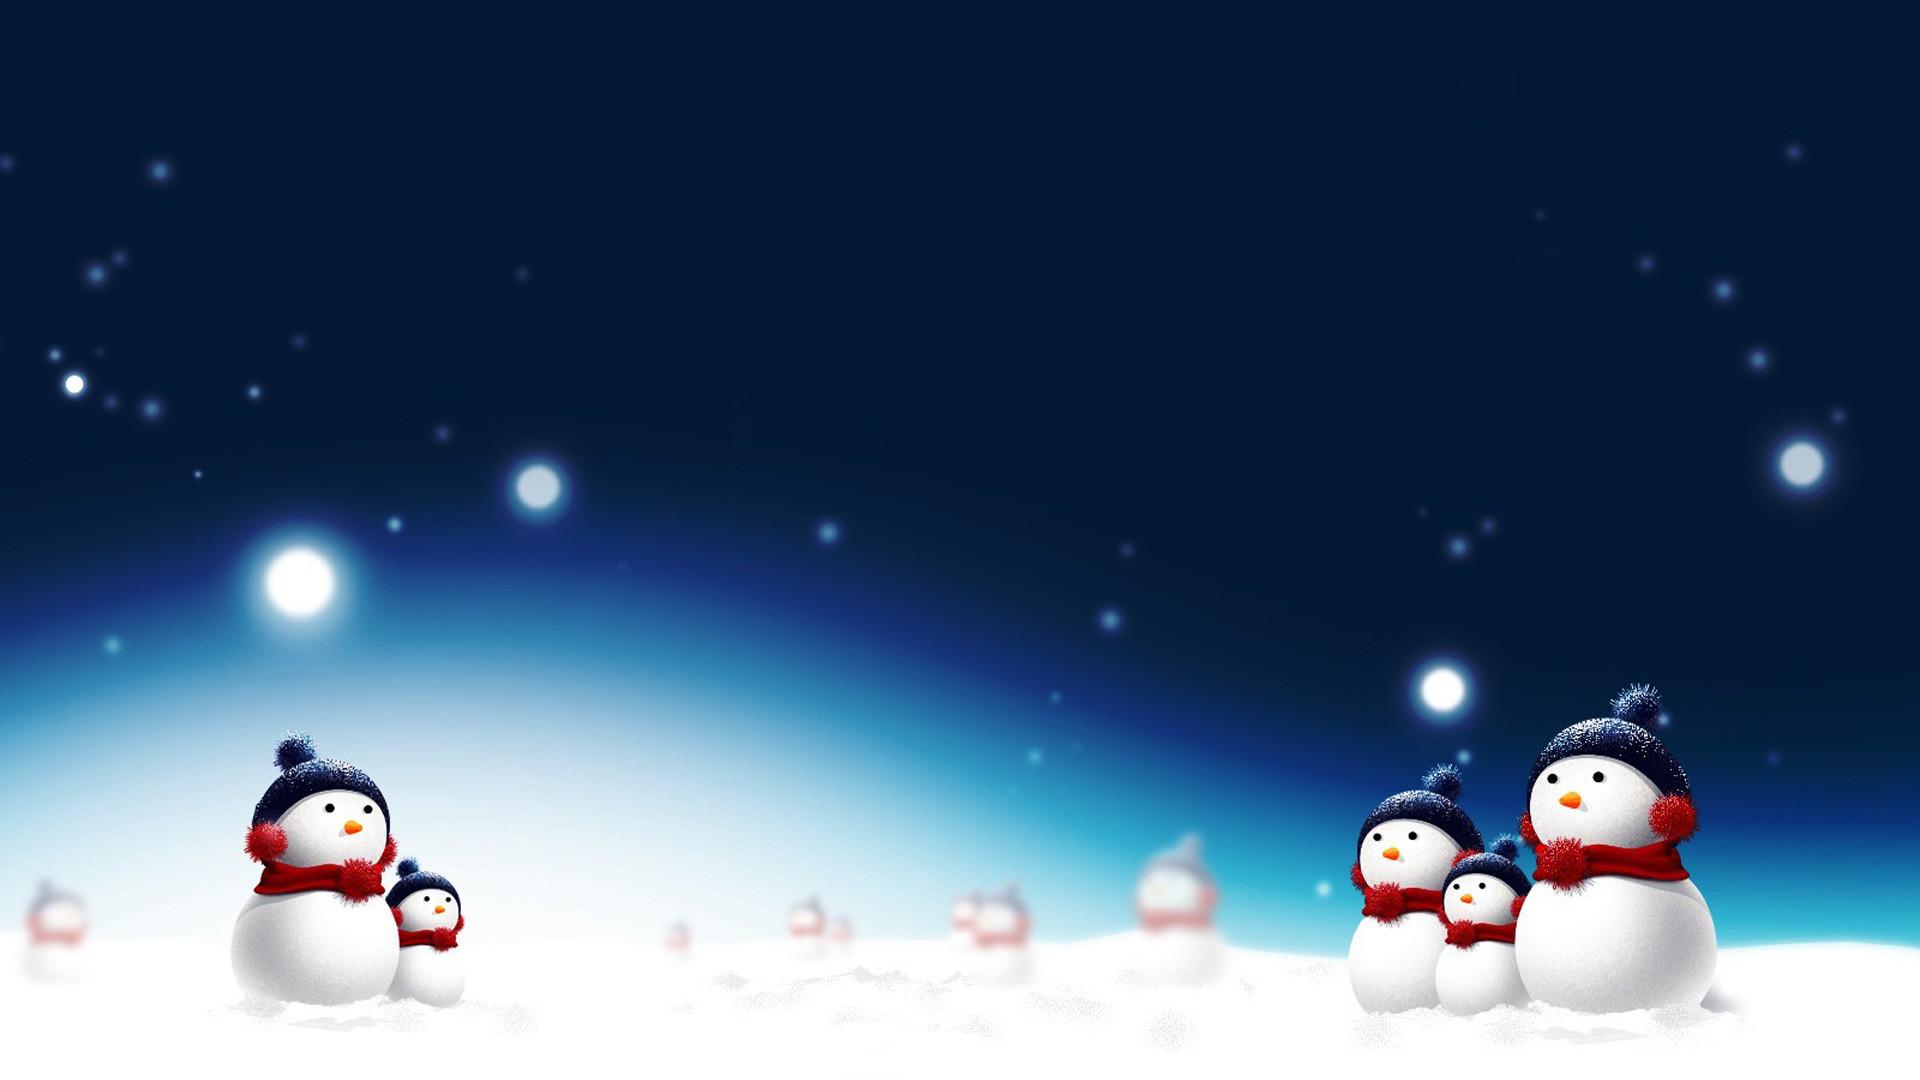 Animated desktop wallpaper christmas